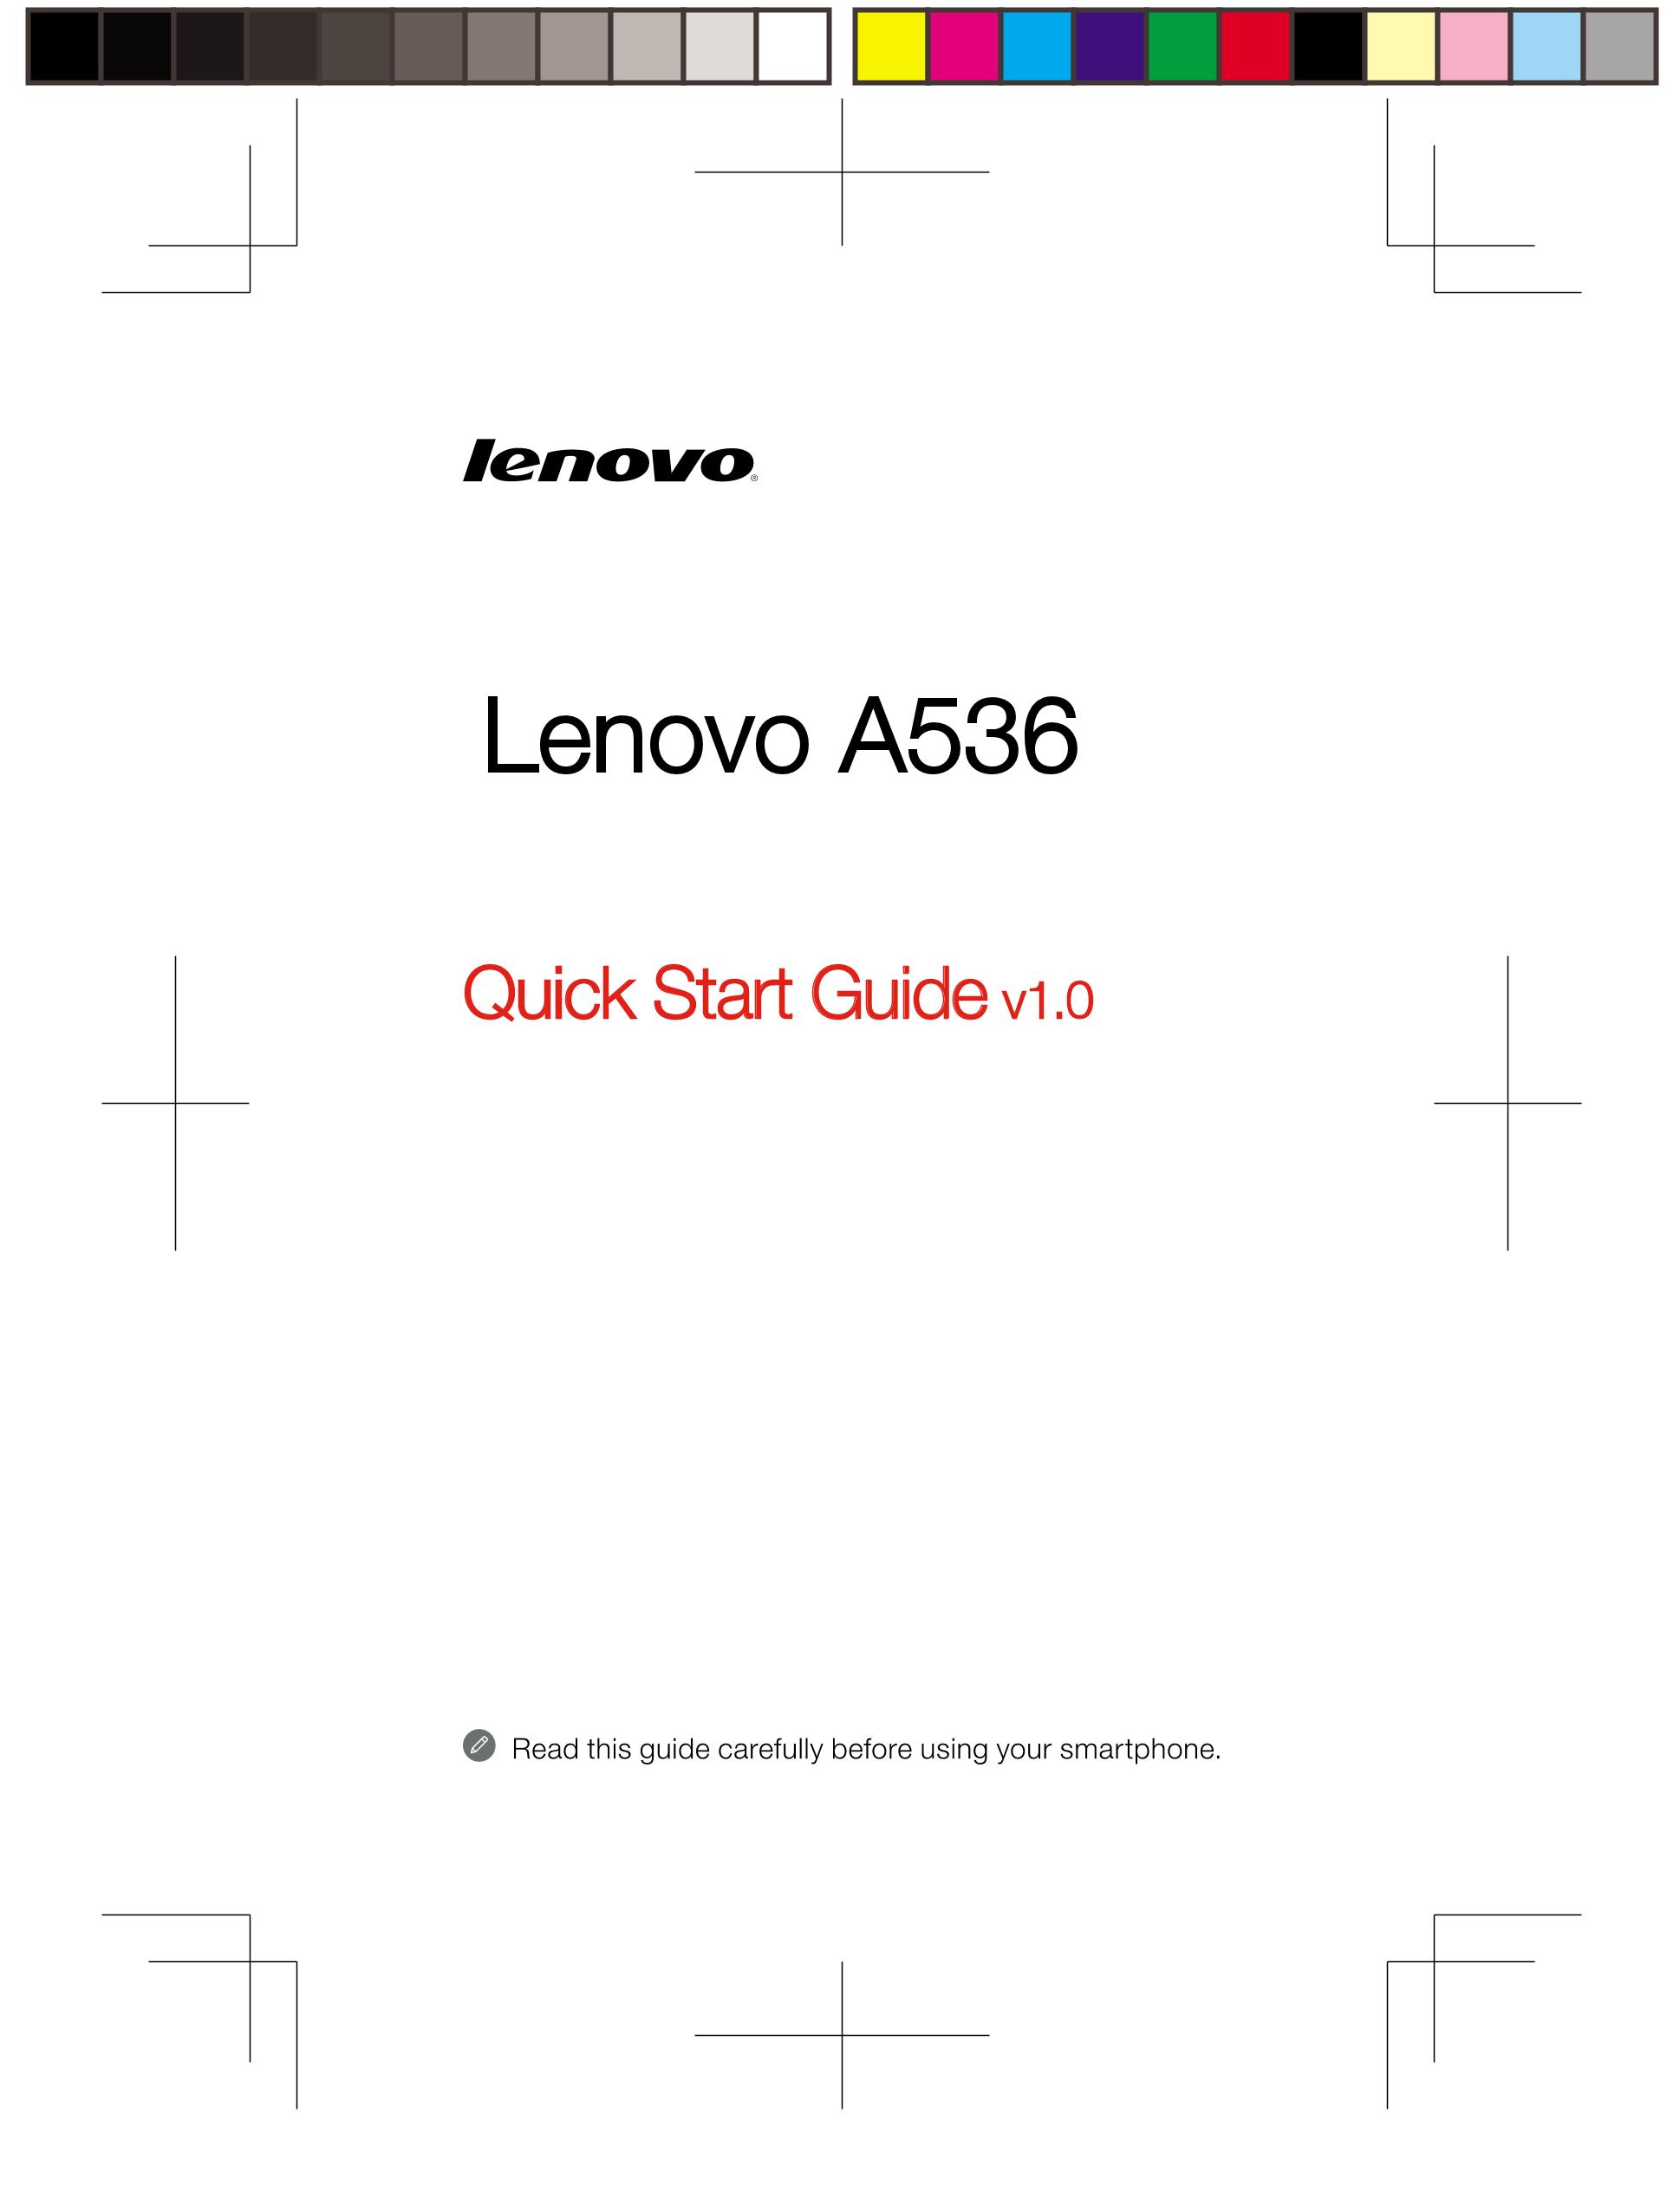 metatrader 5 user manual pdf